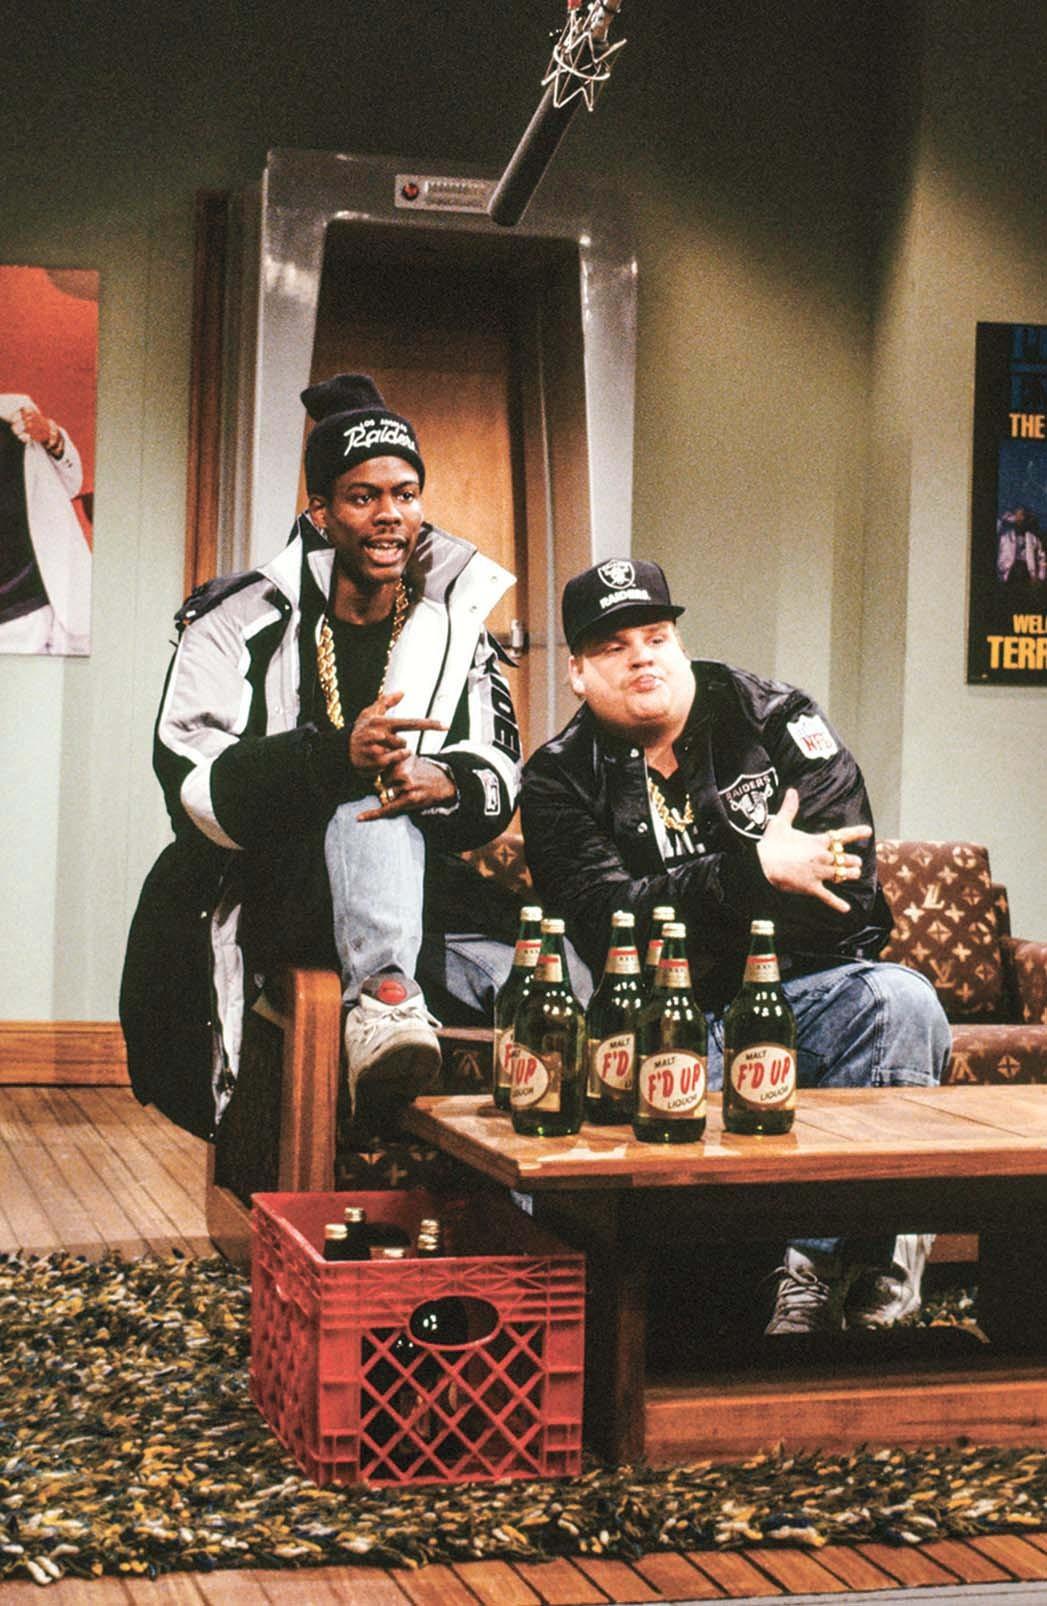 Saturday Night Live -Chris Rock and Chris Farley